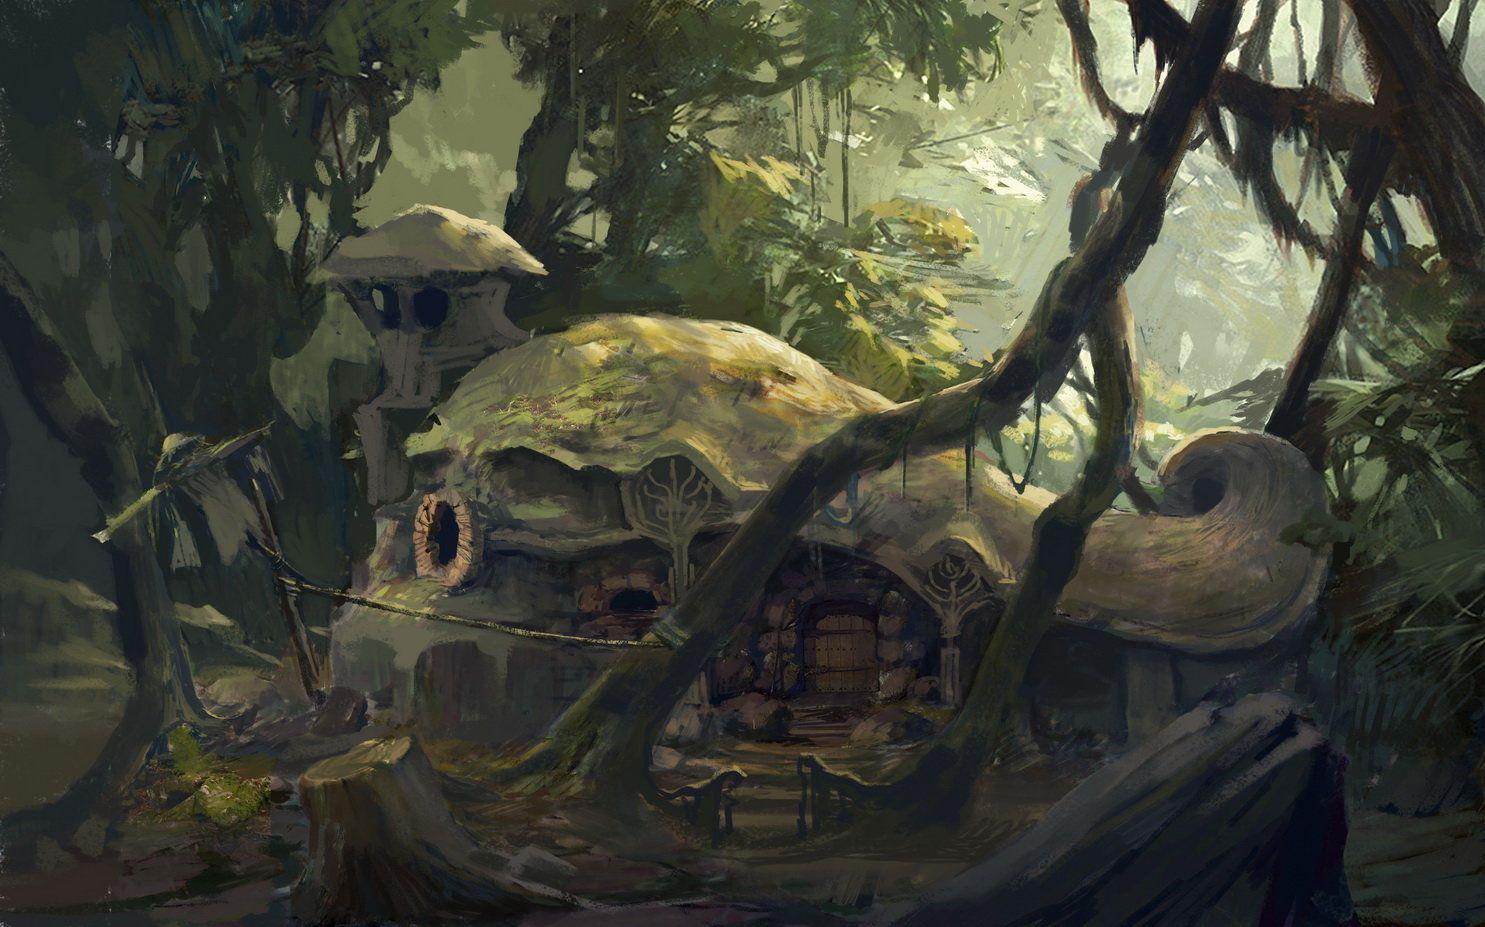 Forest cabin, tao xian on ArtStation at https://www.artstation.com/artwork/eJoxw